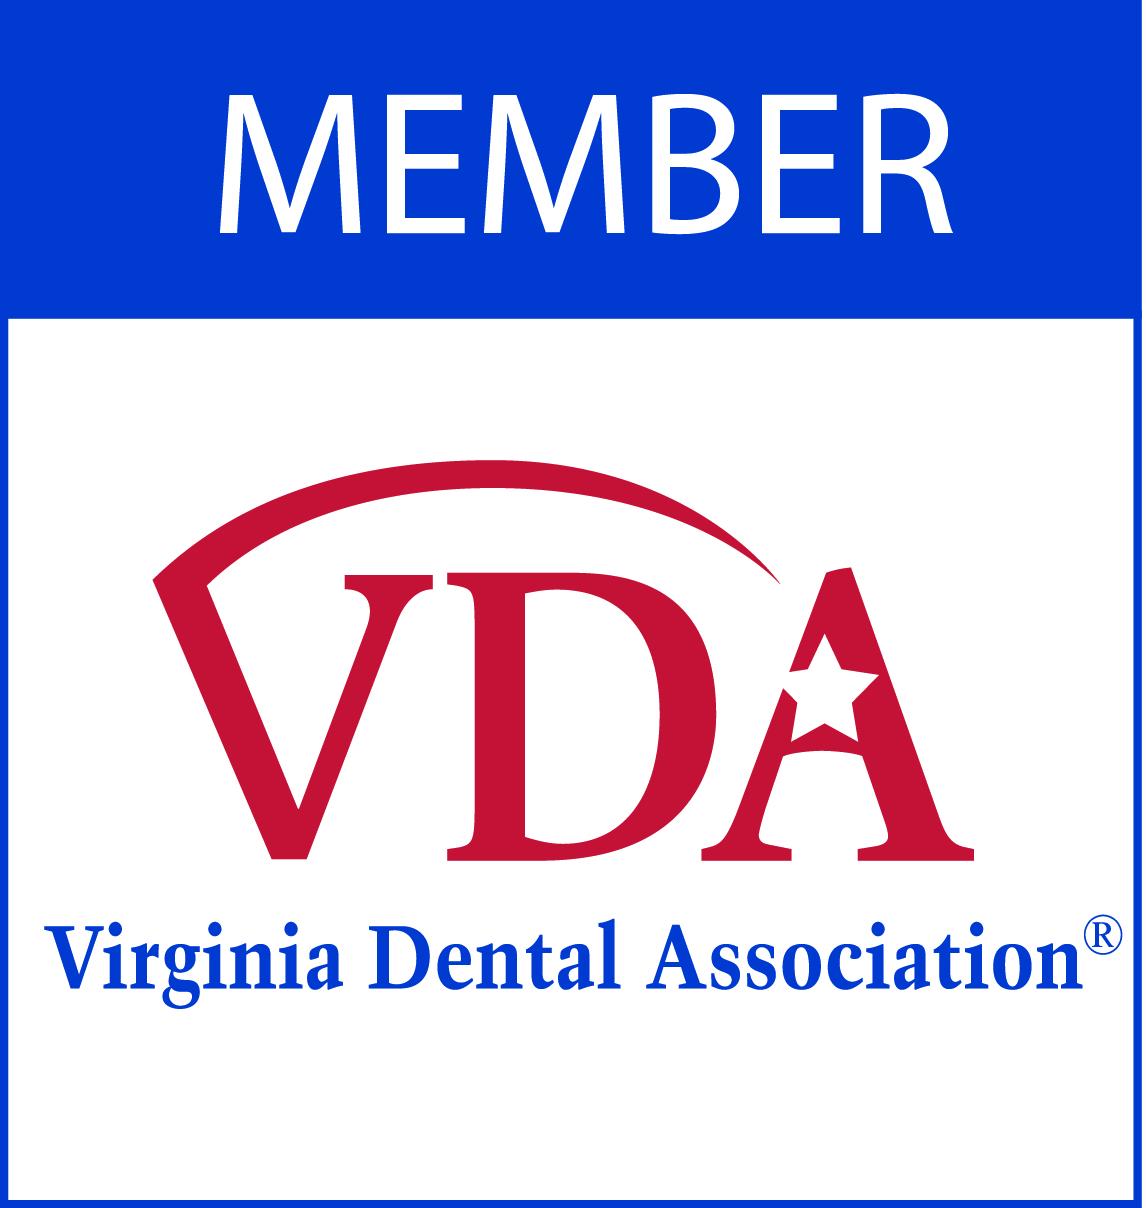 Davis Dental Group | Midlothian, Bon Air, Richmond VA Dentist